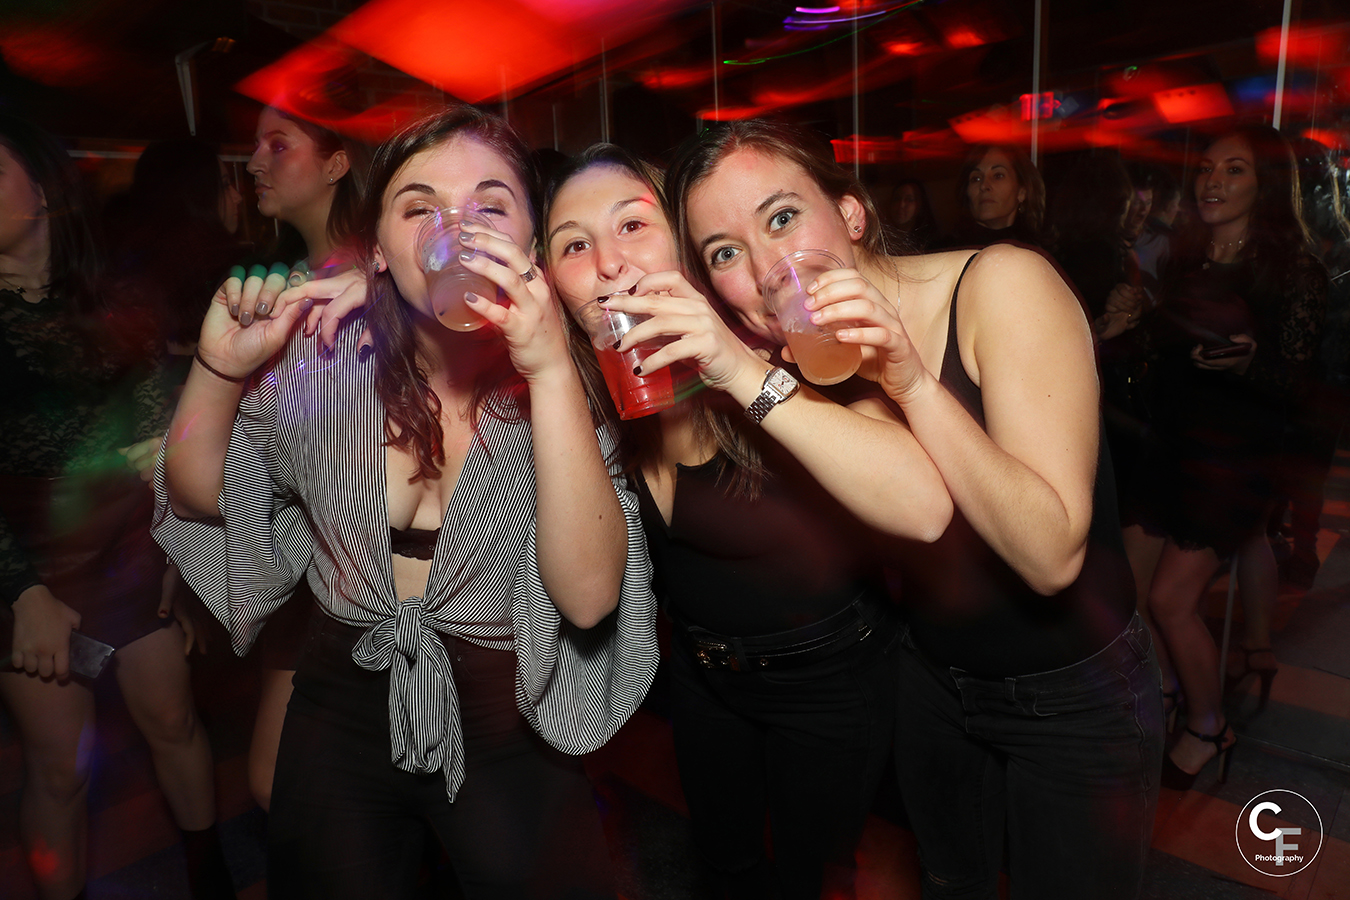 Corey Fader_Upenn_Penn_photography_club_clubbing_party_bday_birthday_light streaks_drinks_pulse nightclub